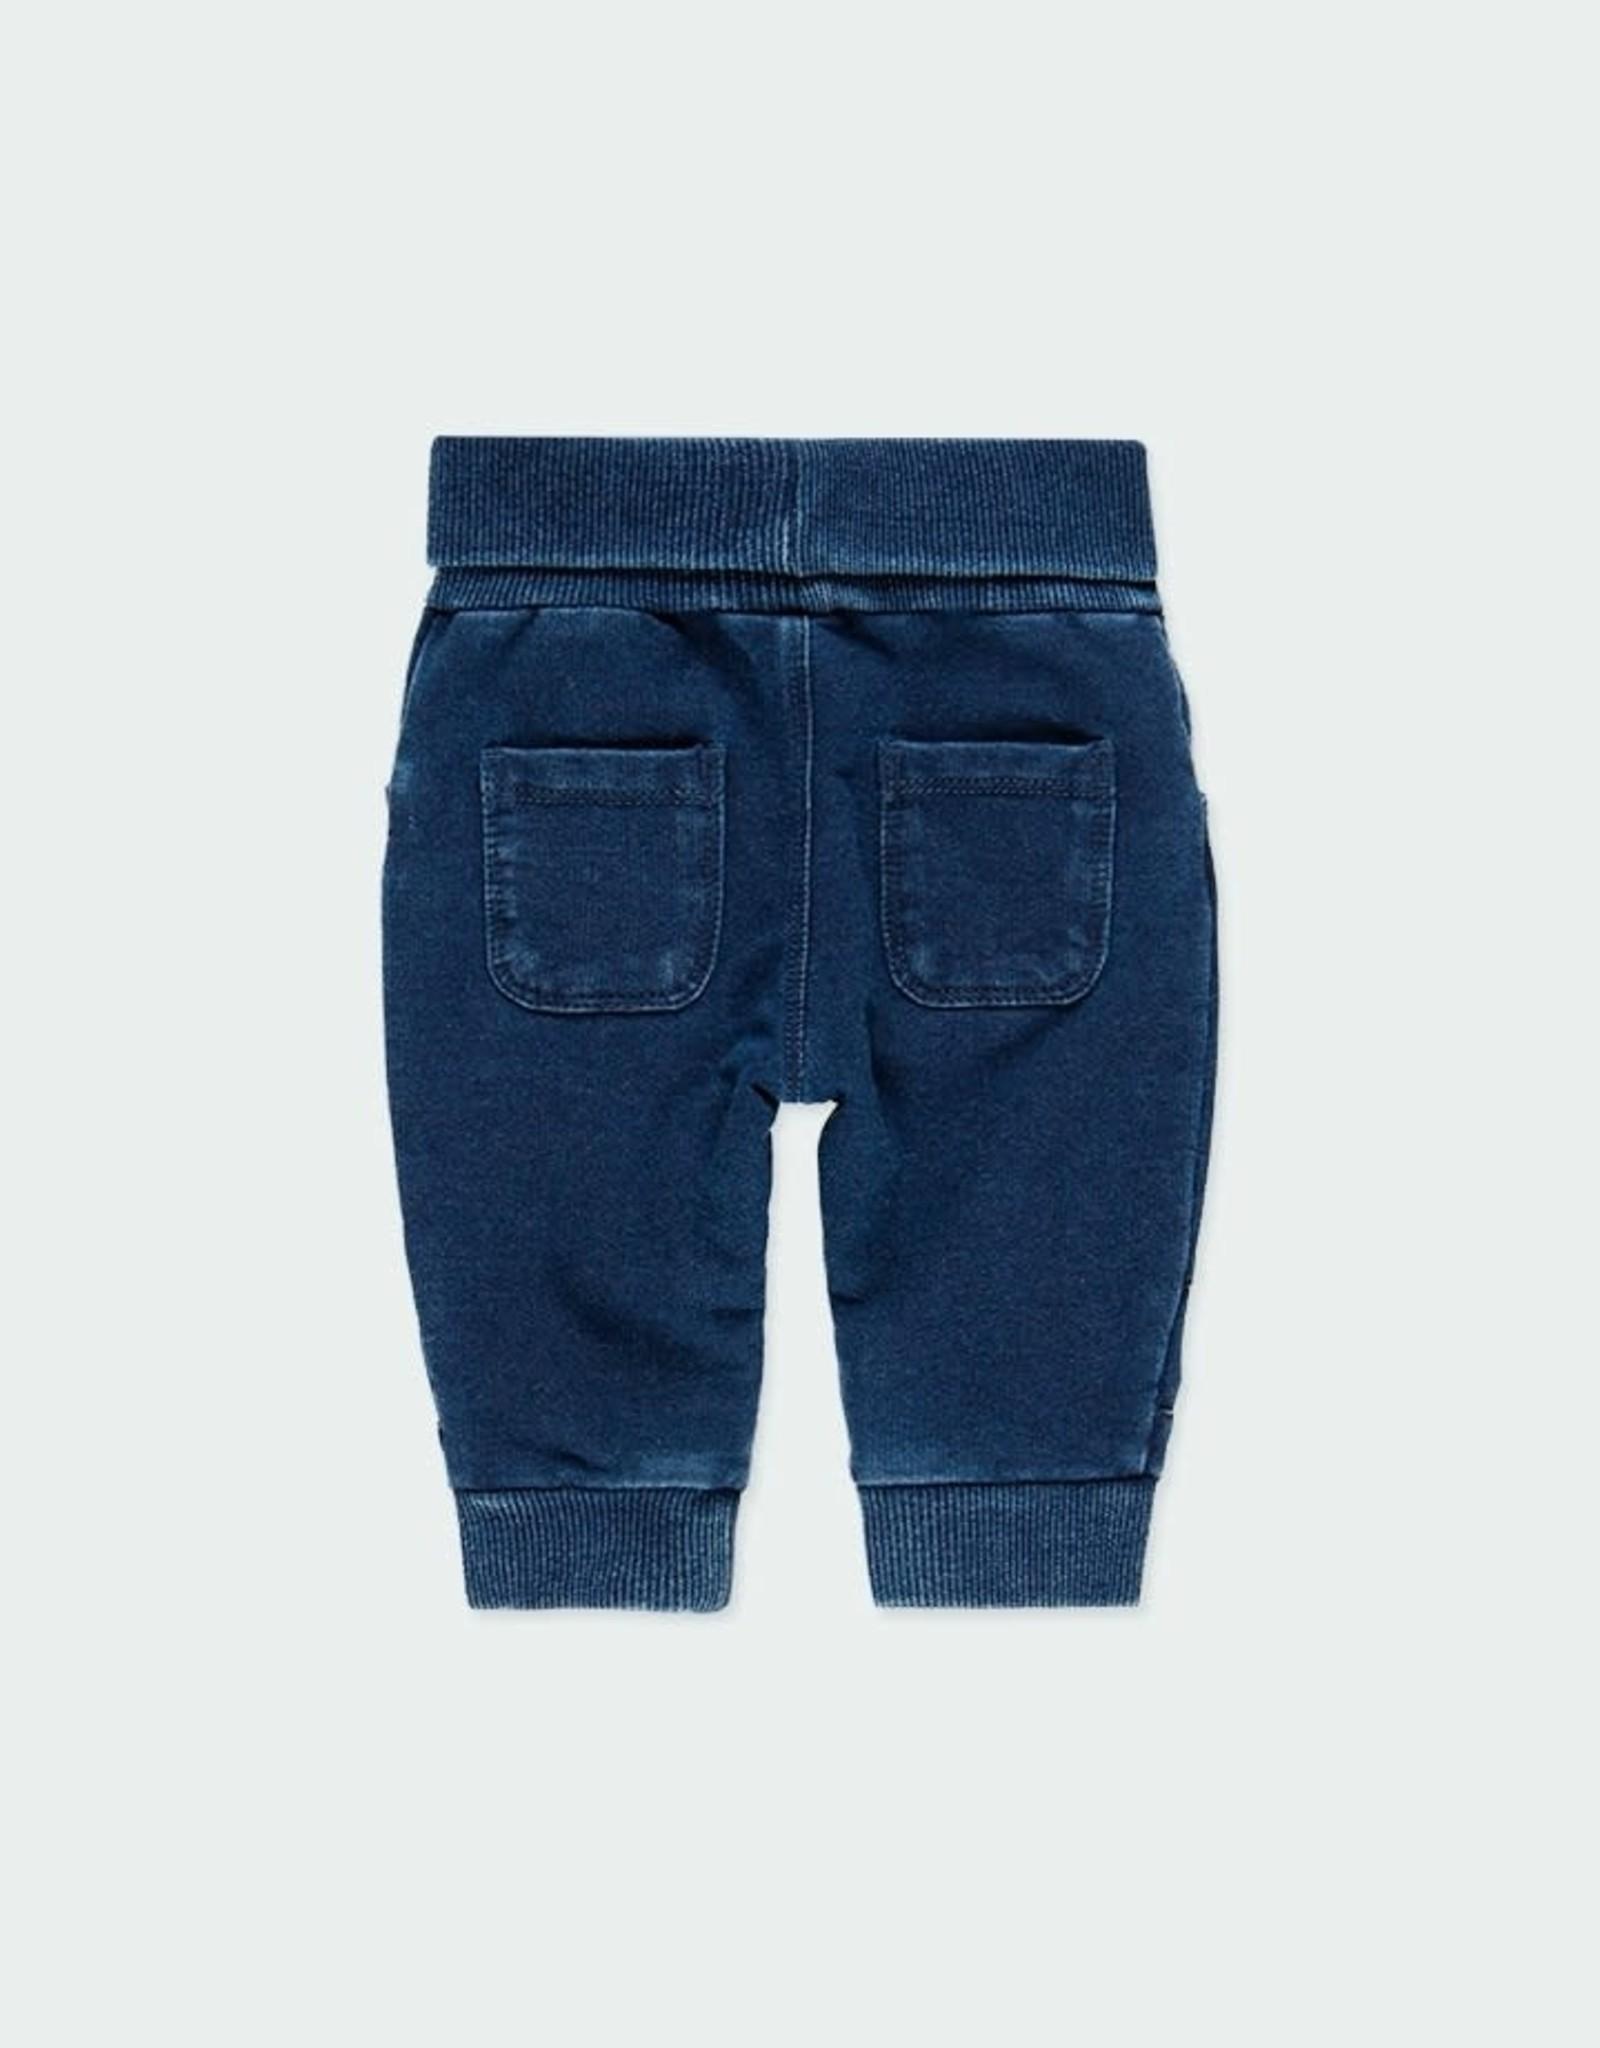 Boboli Blue Denim Pants